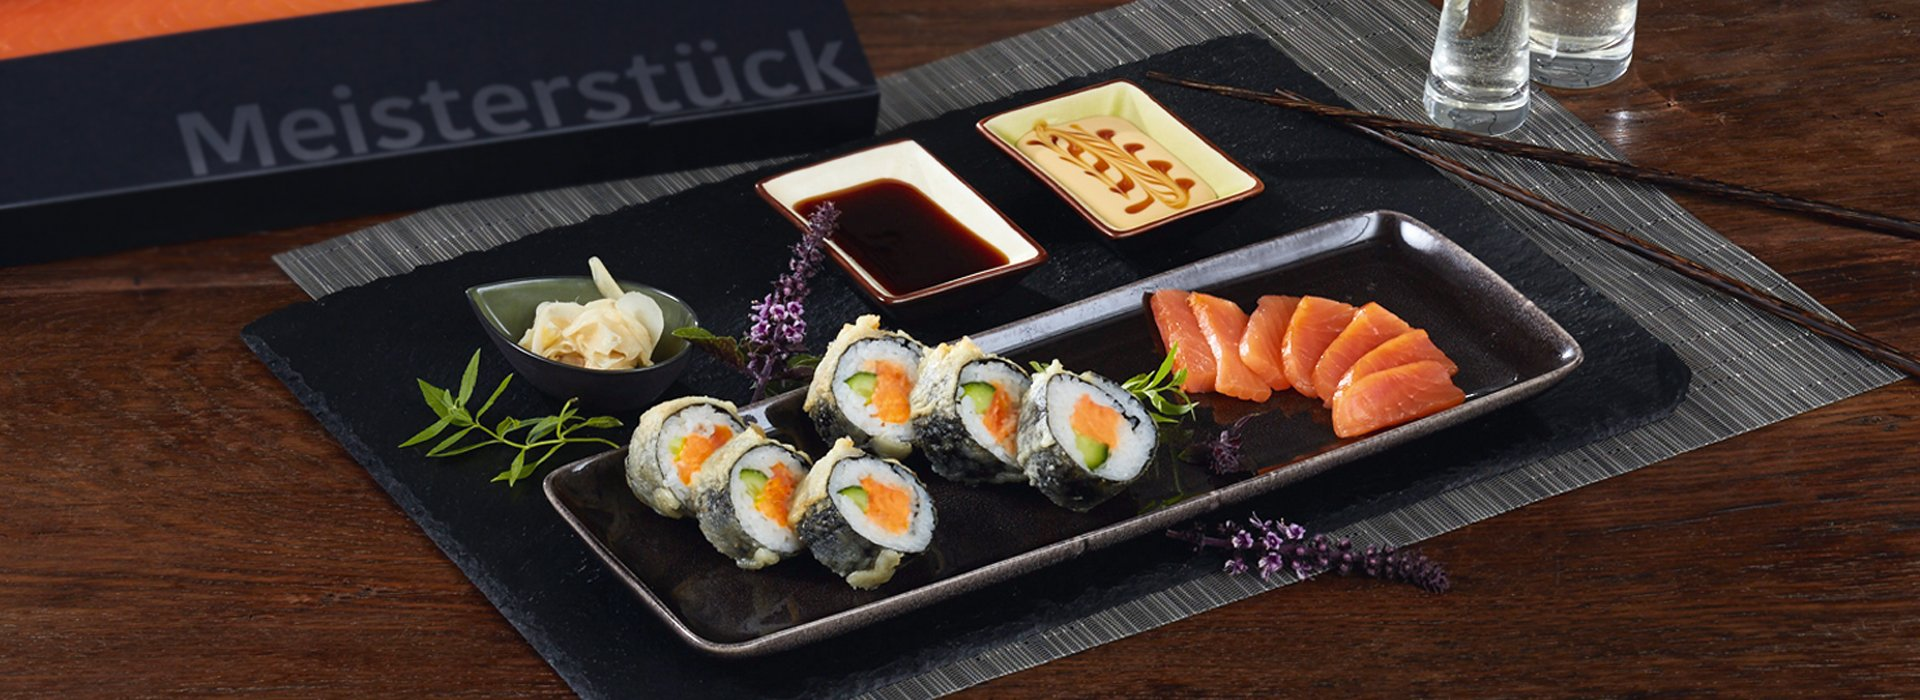 Lachs Sushi: Crunchy Salmon Roll mit Wasabi Creme